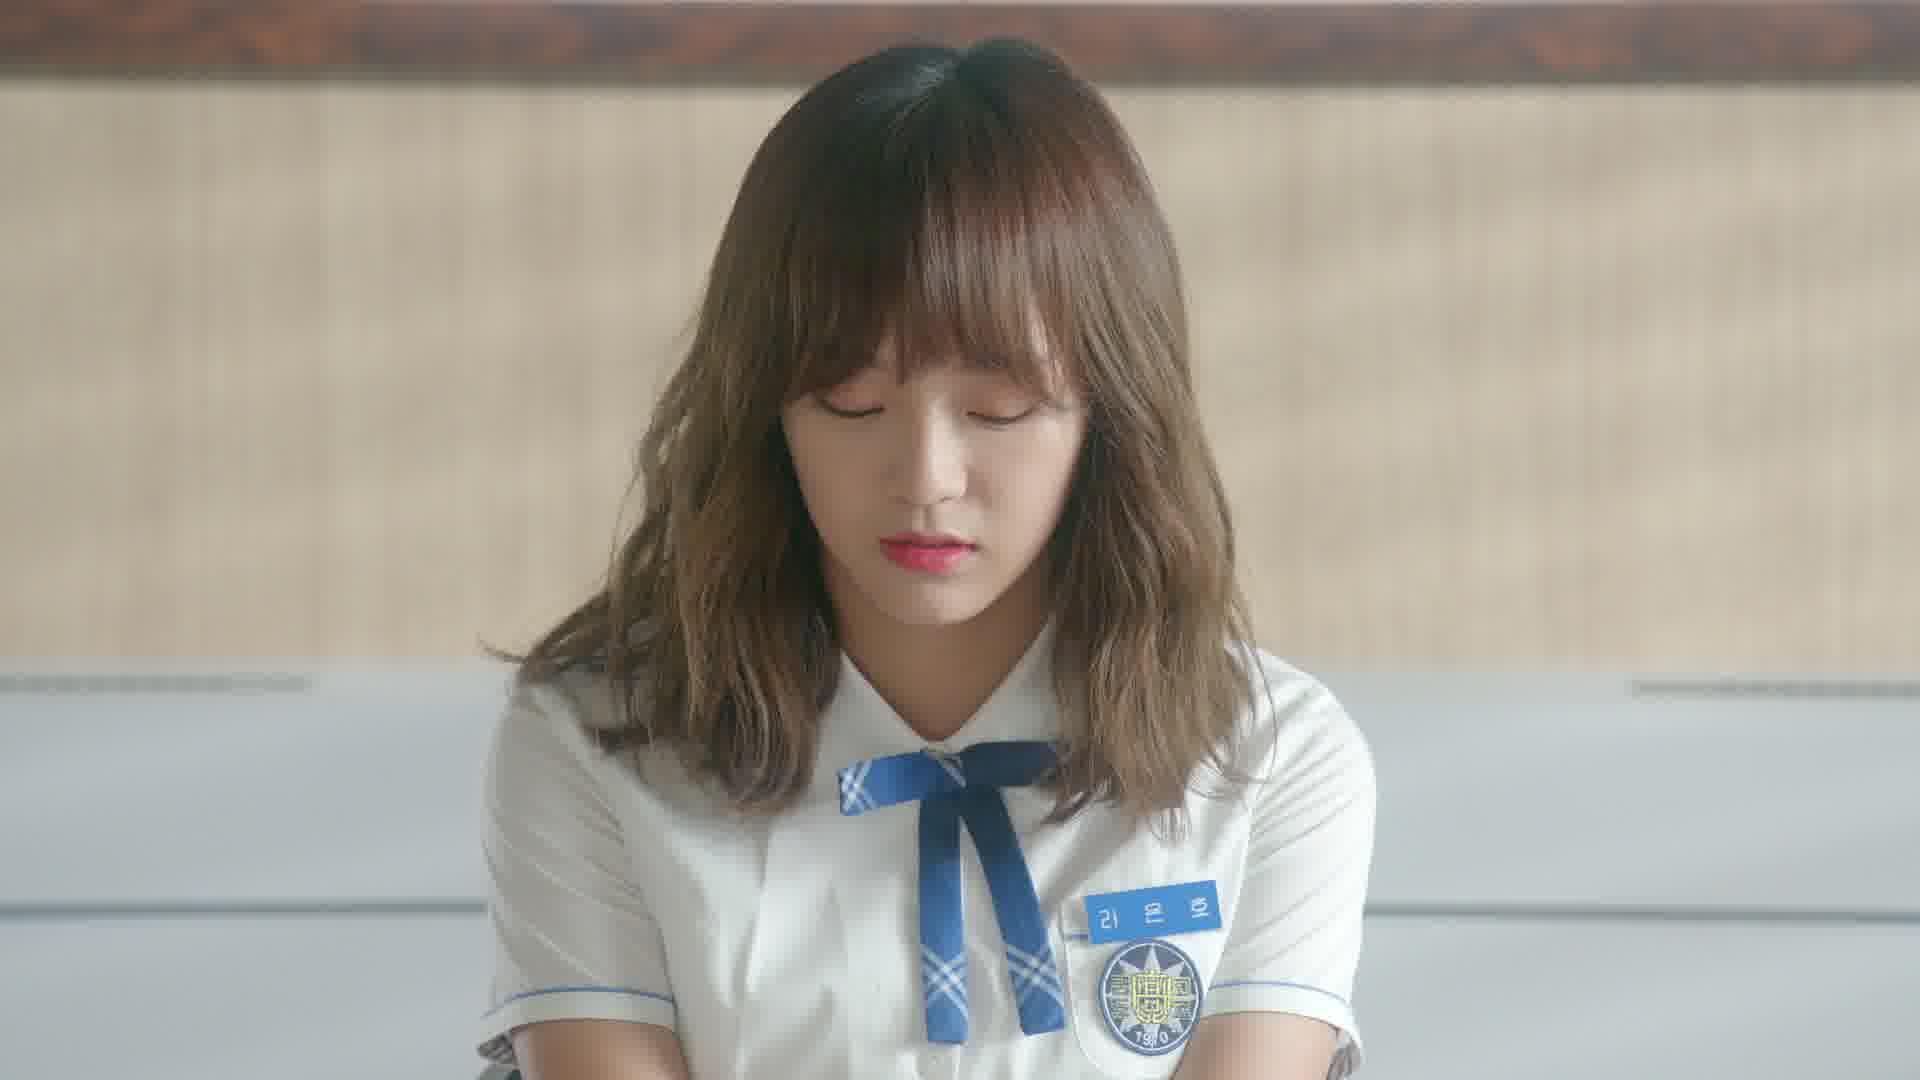 School 2017 - 학교 2017 - Watch Full Episodes Free - Korea